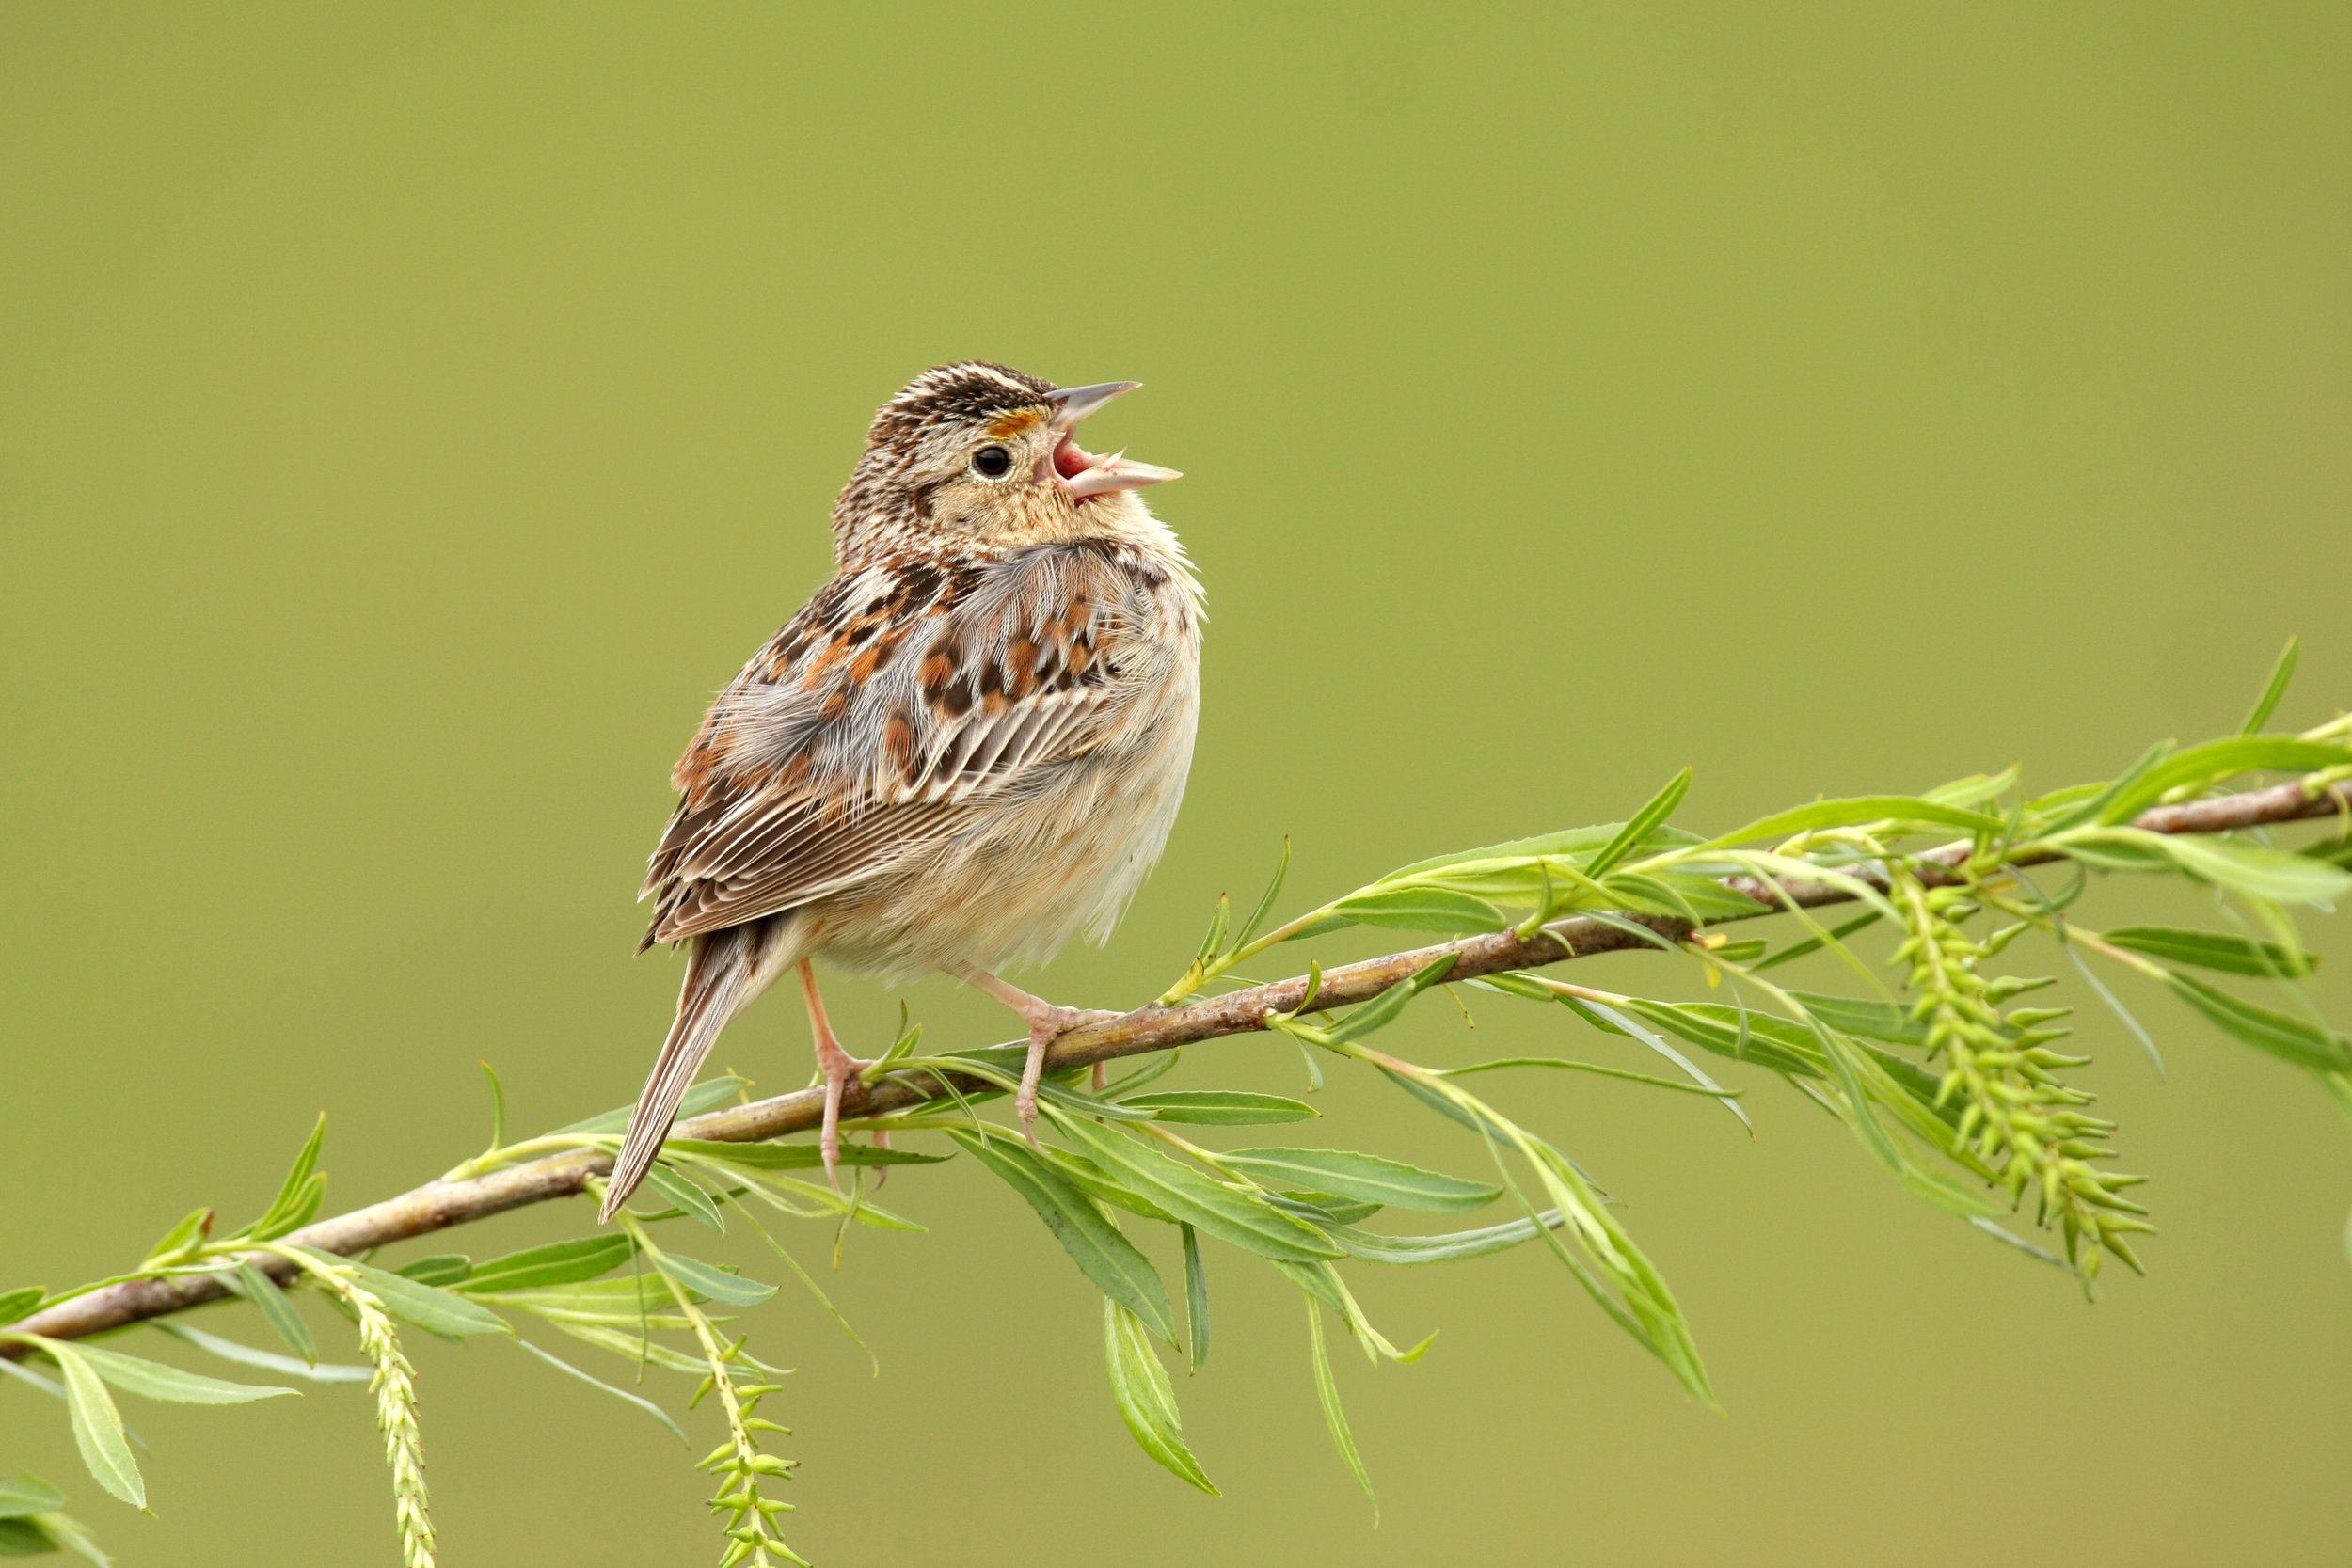 grasshopper_sparrow_0166017b.jpg